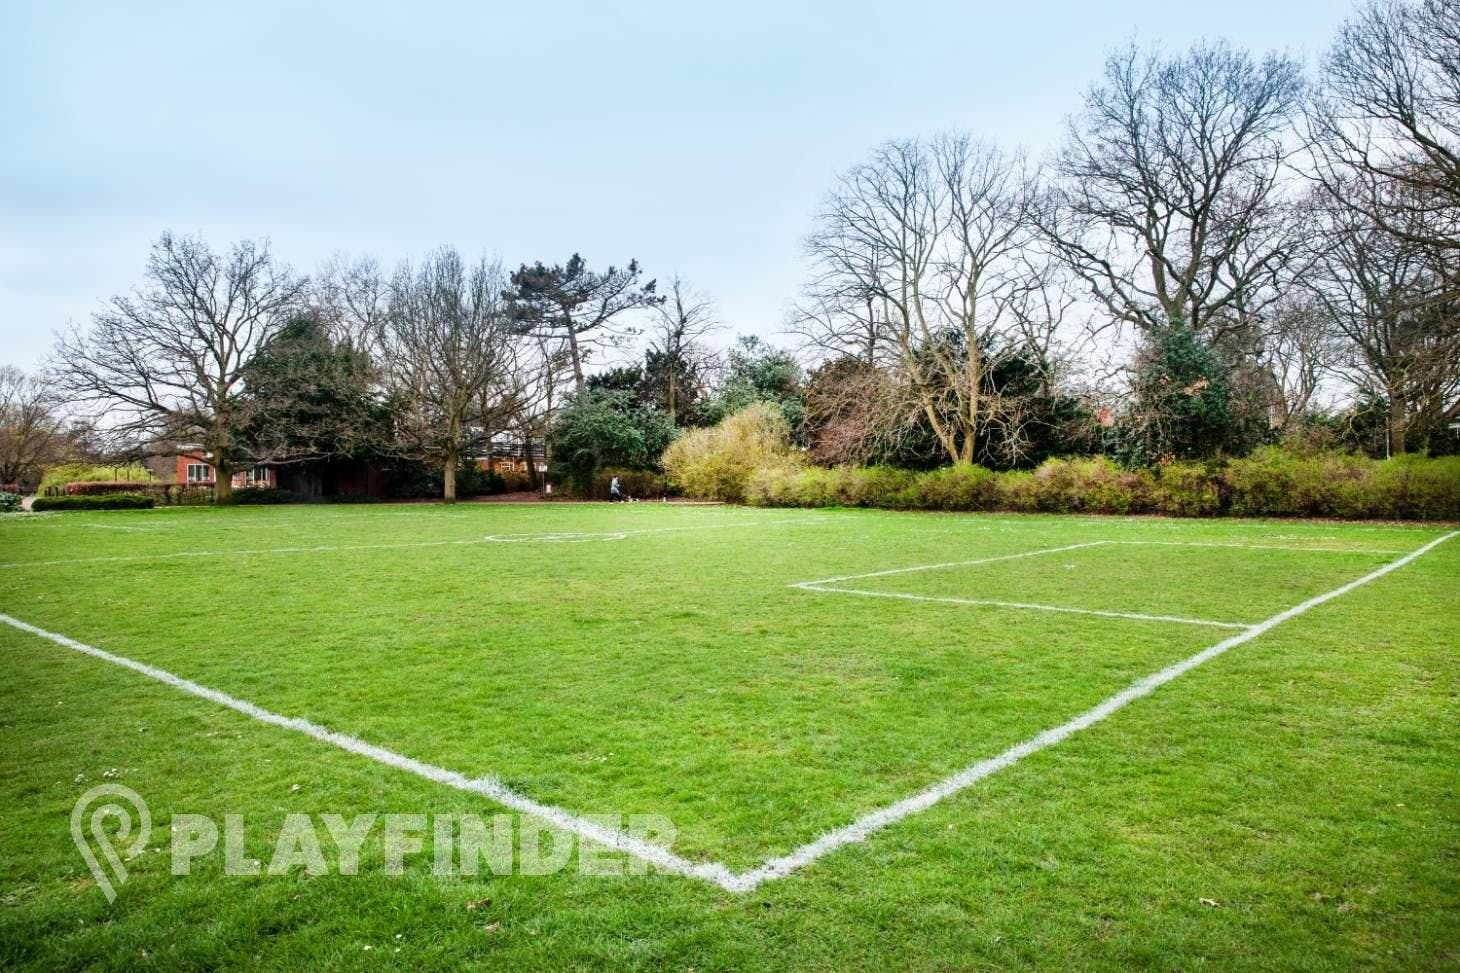 Russell Park 7 a side   Grass football pitch